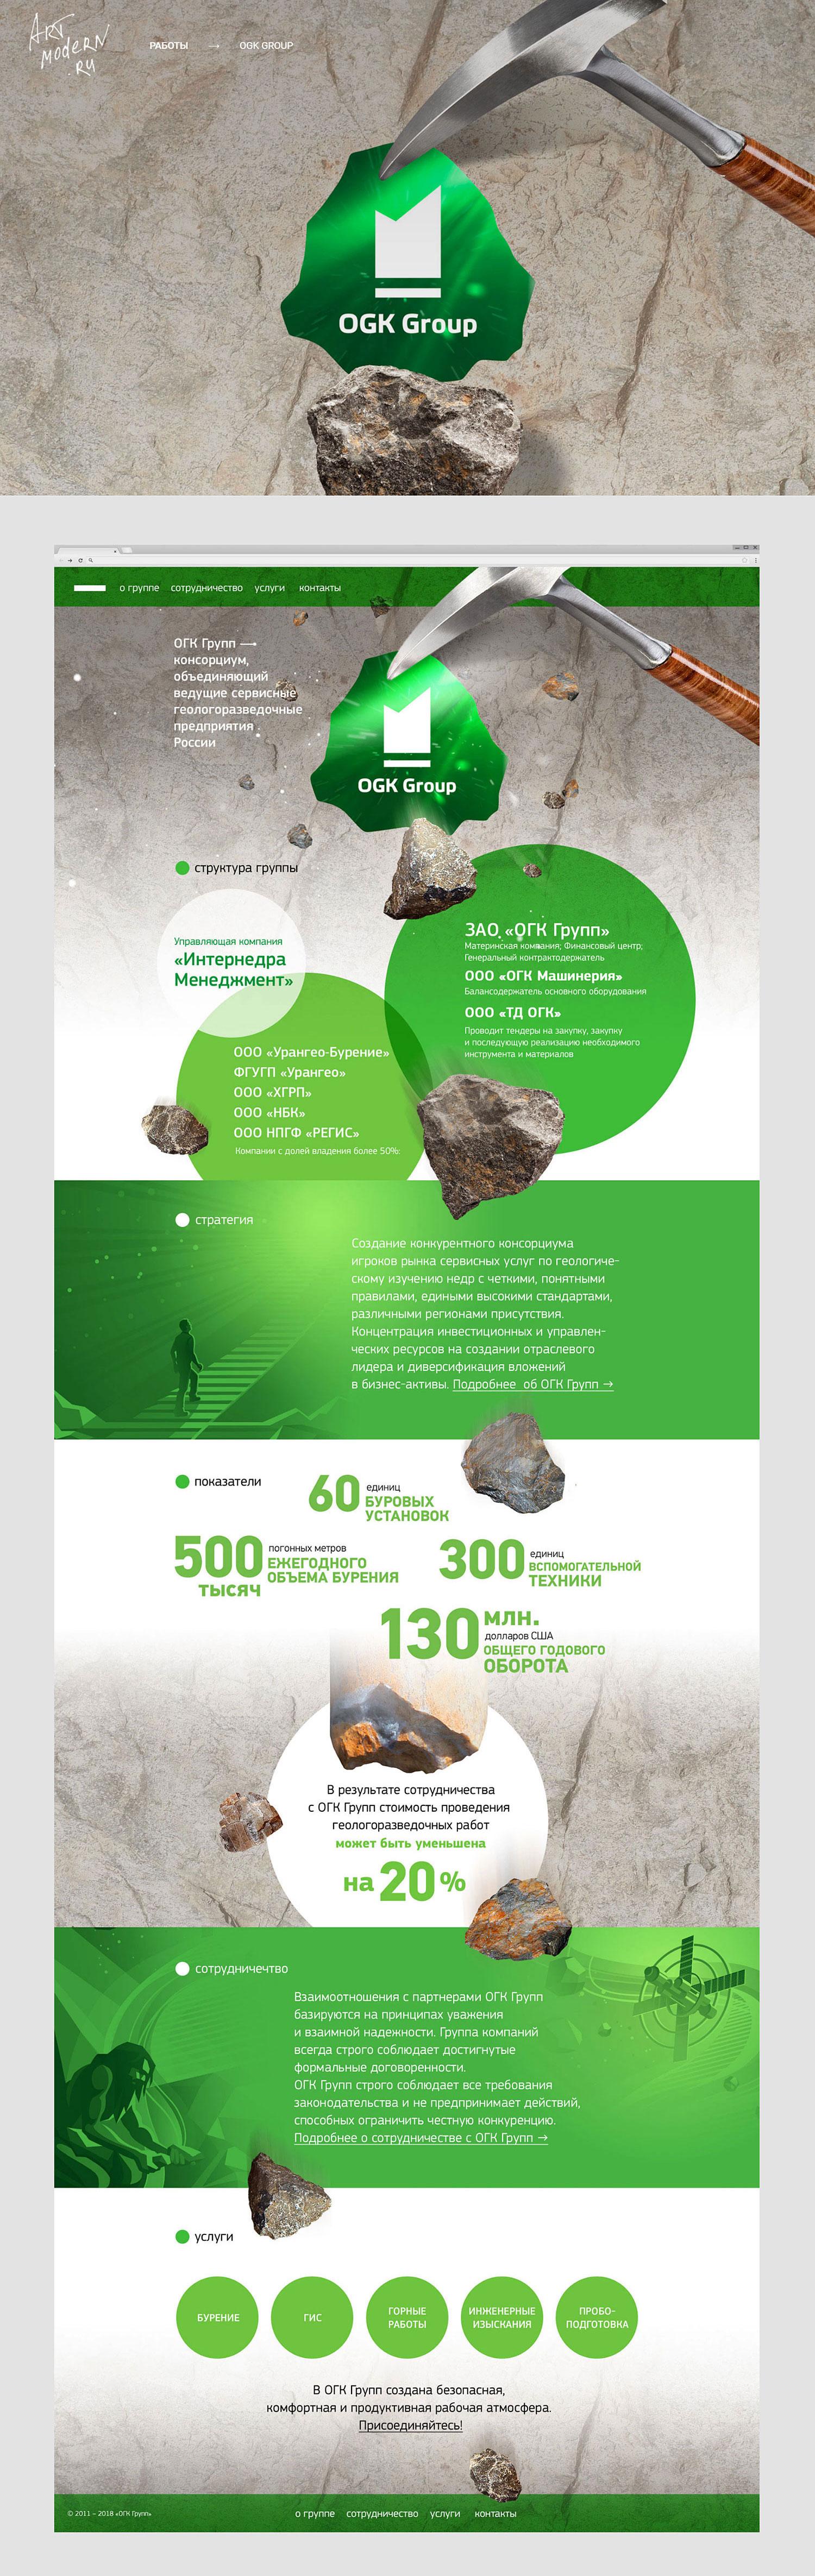 OGK Геологоразведка